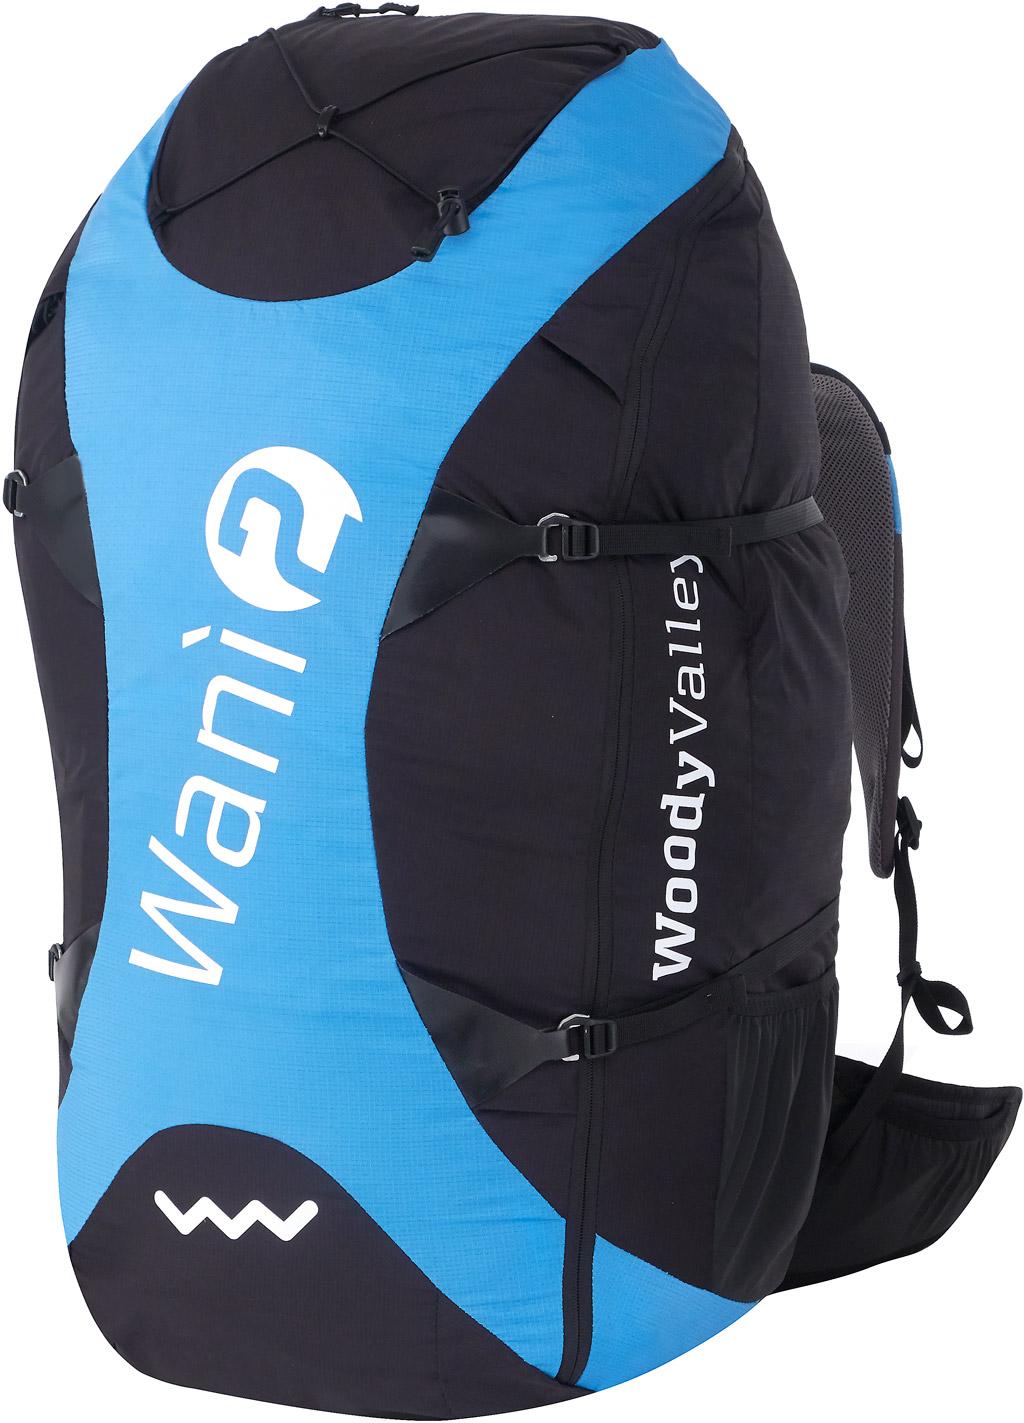 Woody Valley Wani 2 rucksack front